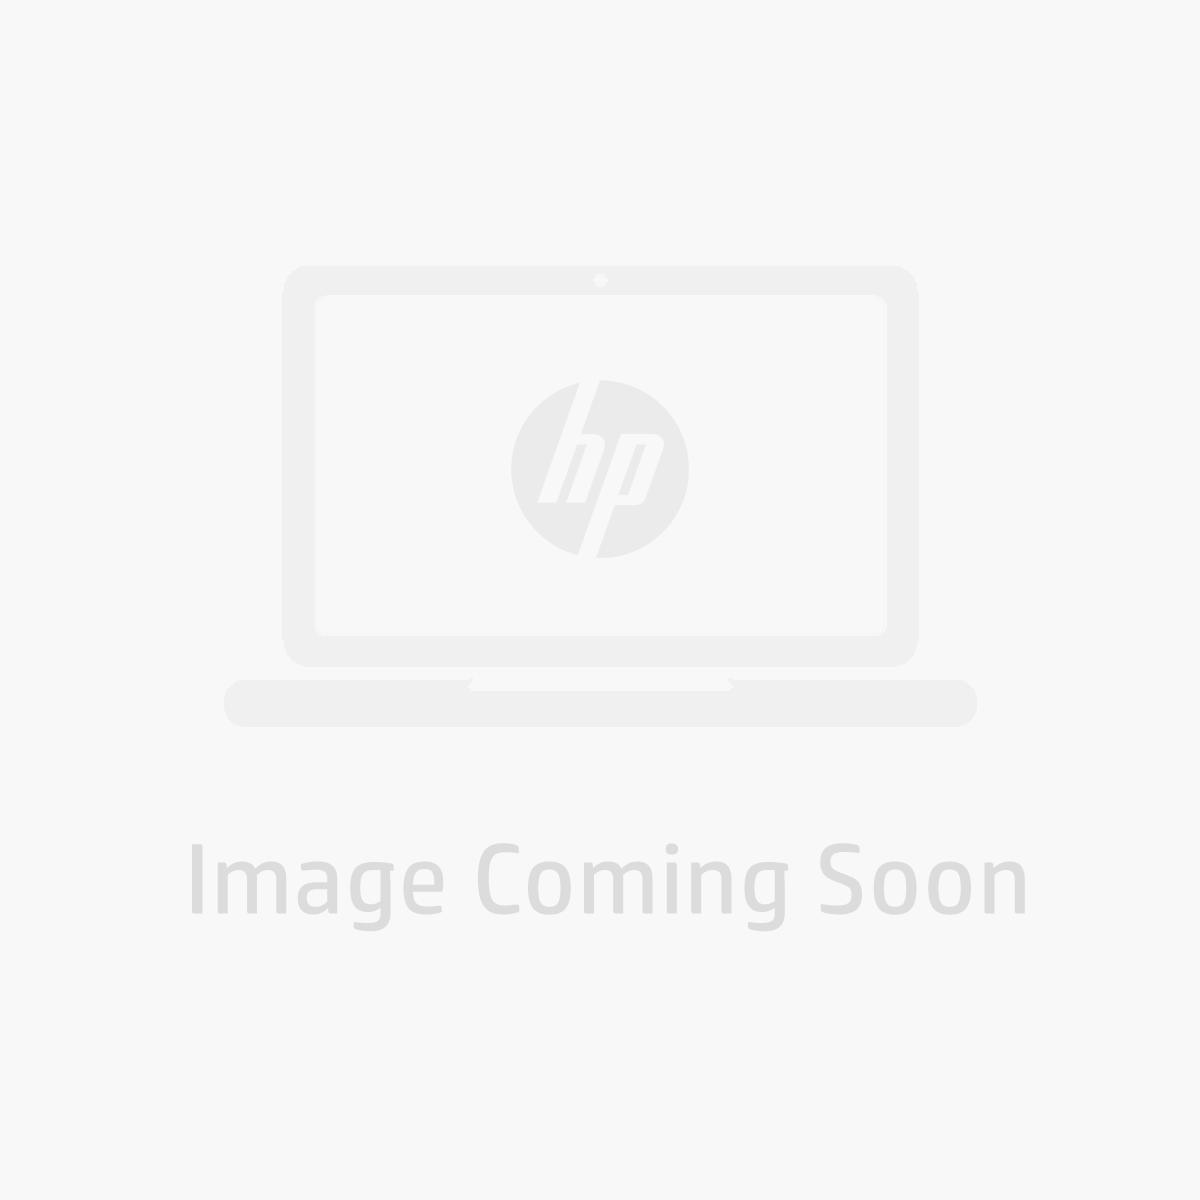 HP Z4000 Blue Wireless Mouse